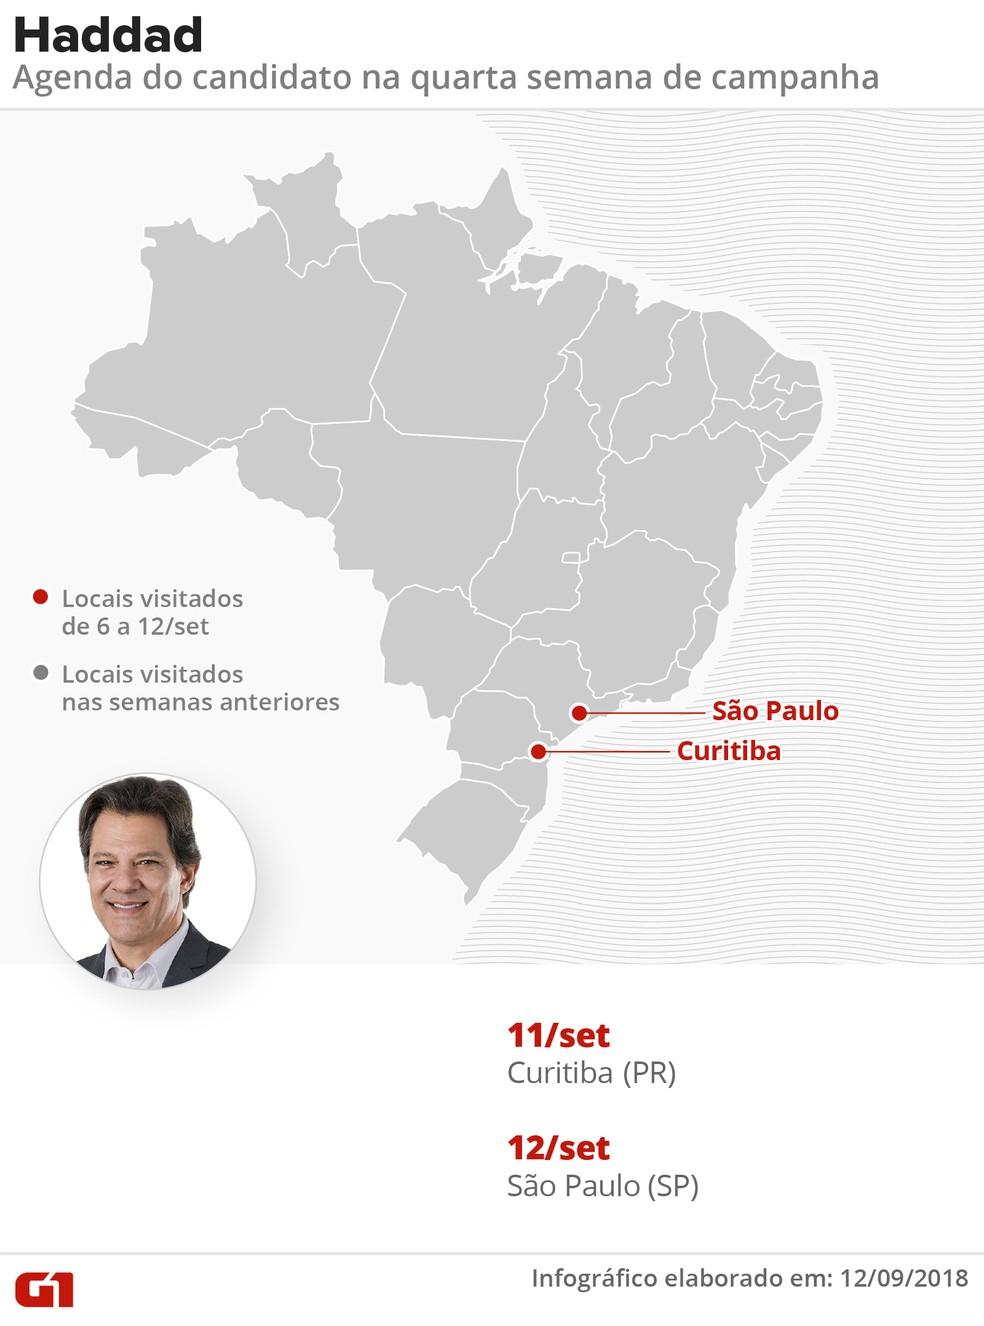 Agenda do candidato Fernando Haddad (PT) na 4ª semana de campanha presidencial — Foto: Roberta Jaworski/G1